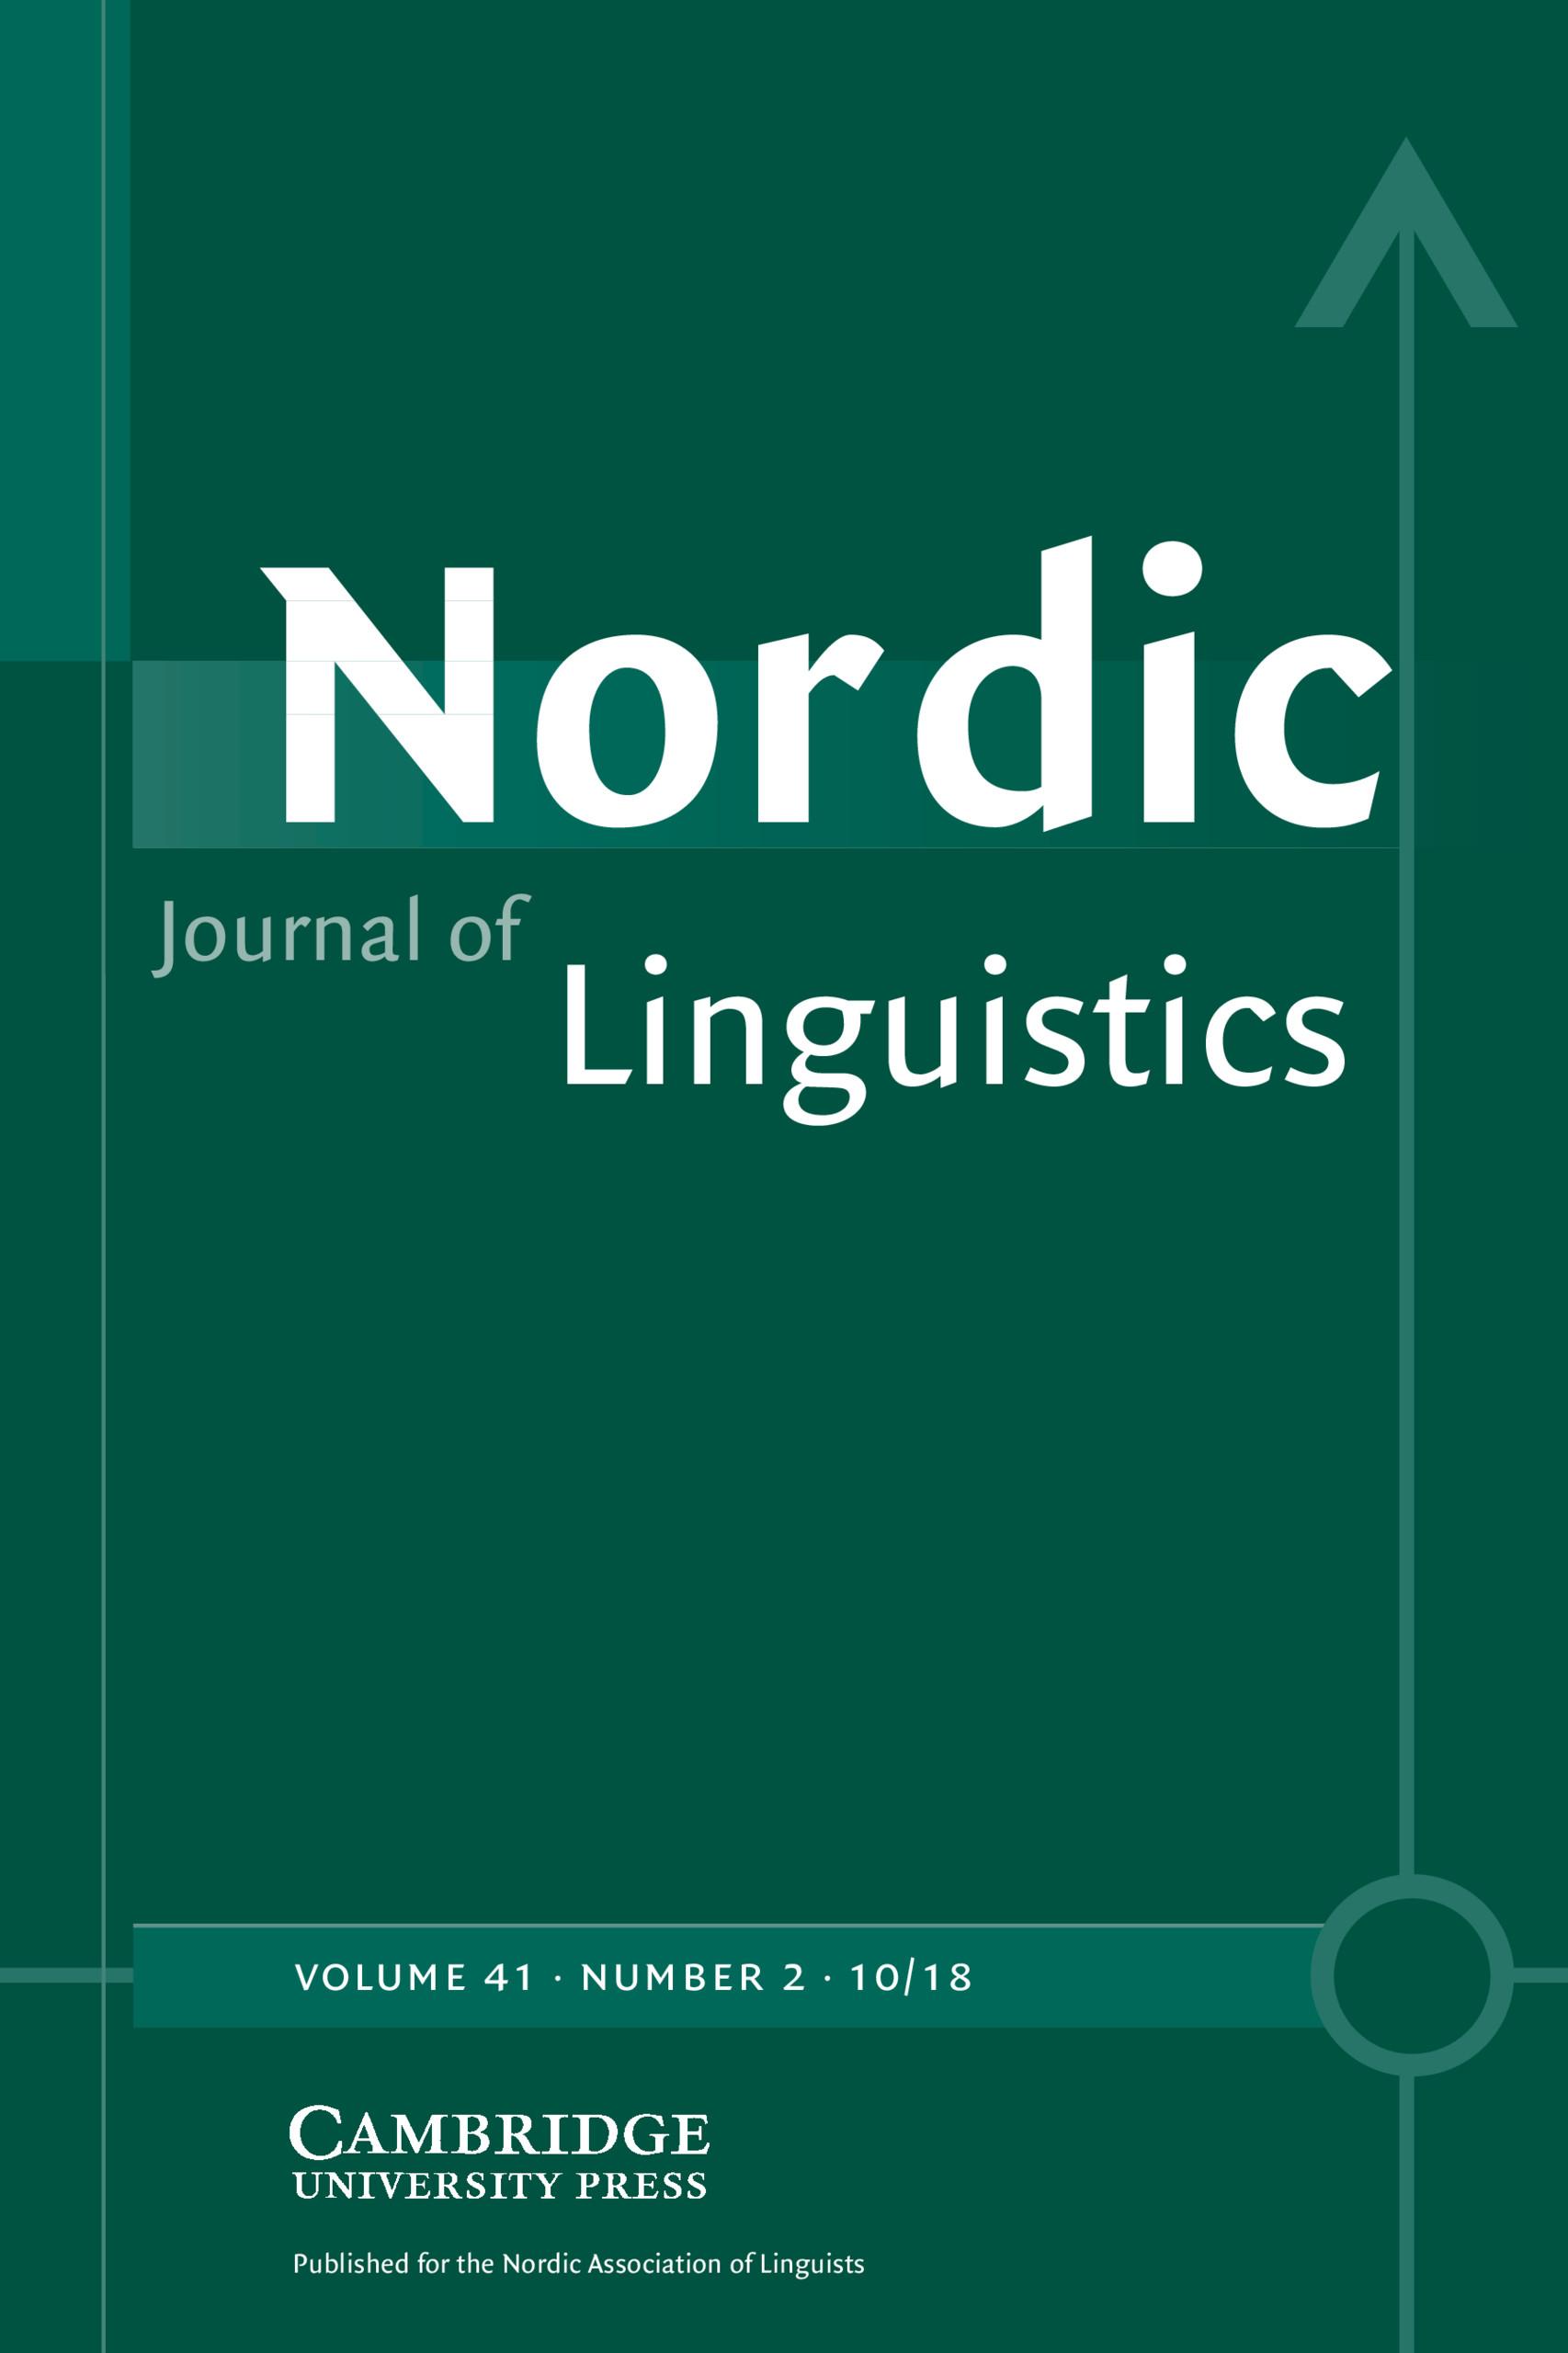 Nordic Journal Of Linguistics Volume 41 Forensic Linguistics European Perspectives Cambridge Core